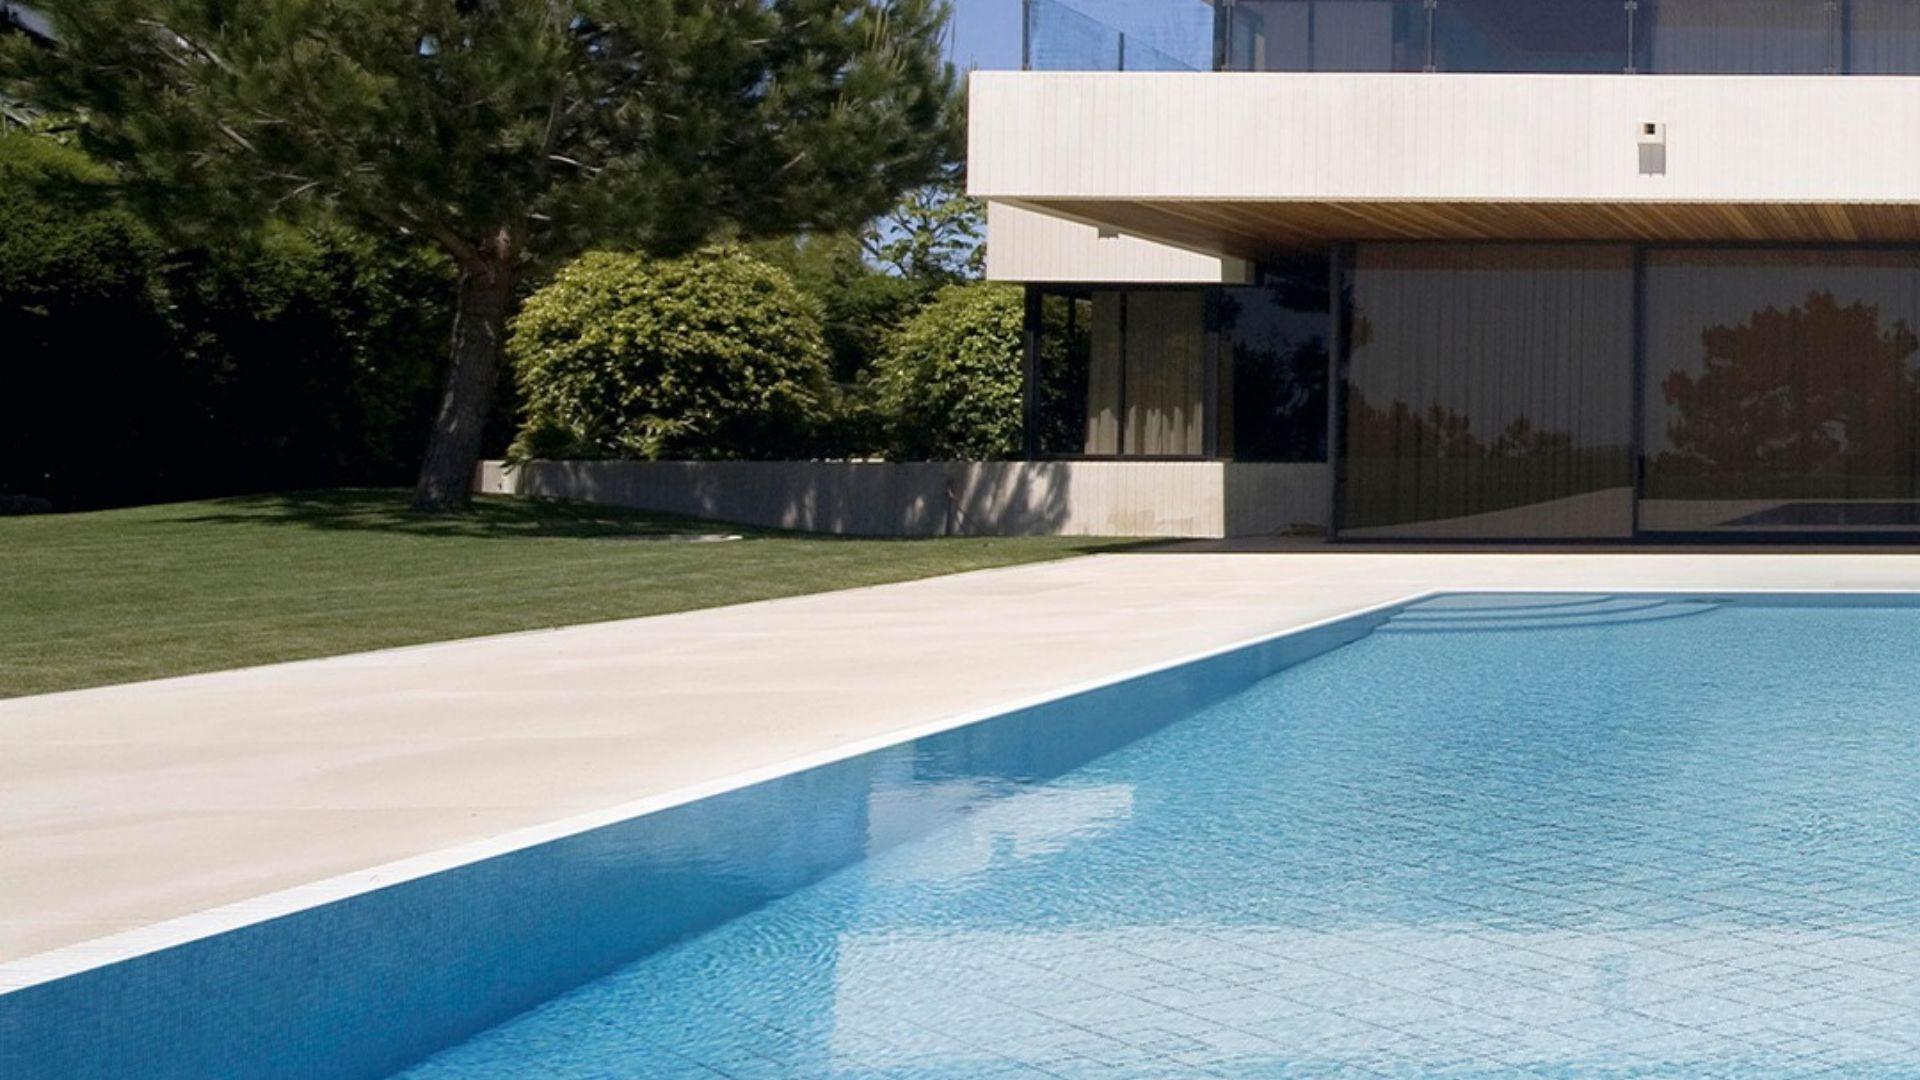 Realizamos azulejos de diseño en Tenerife para tu piscina